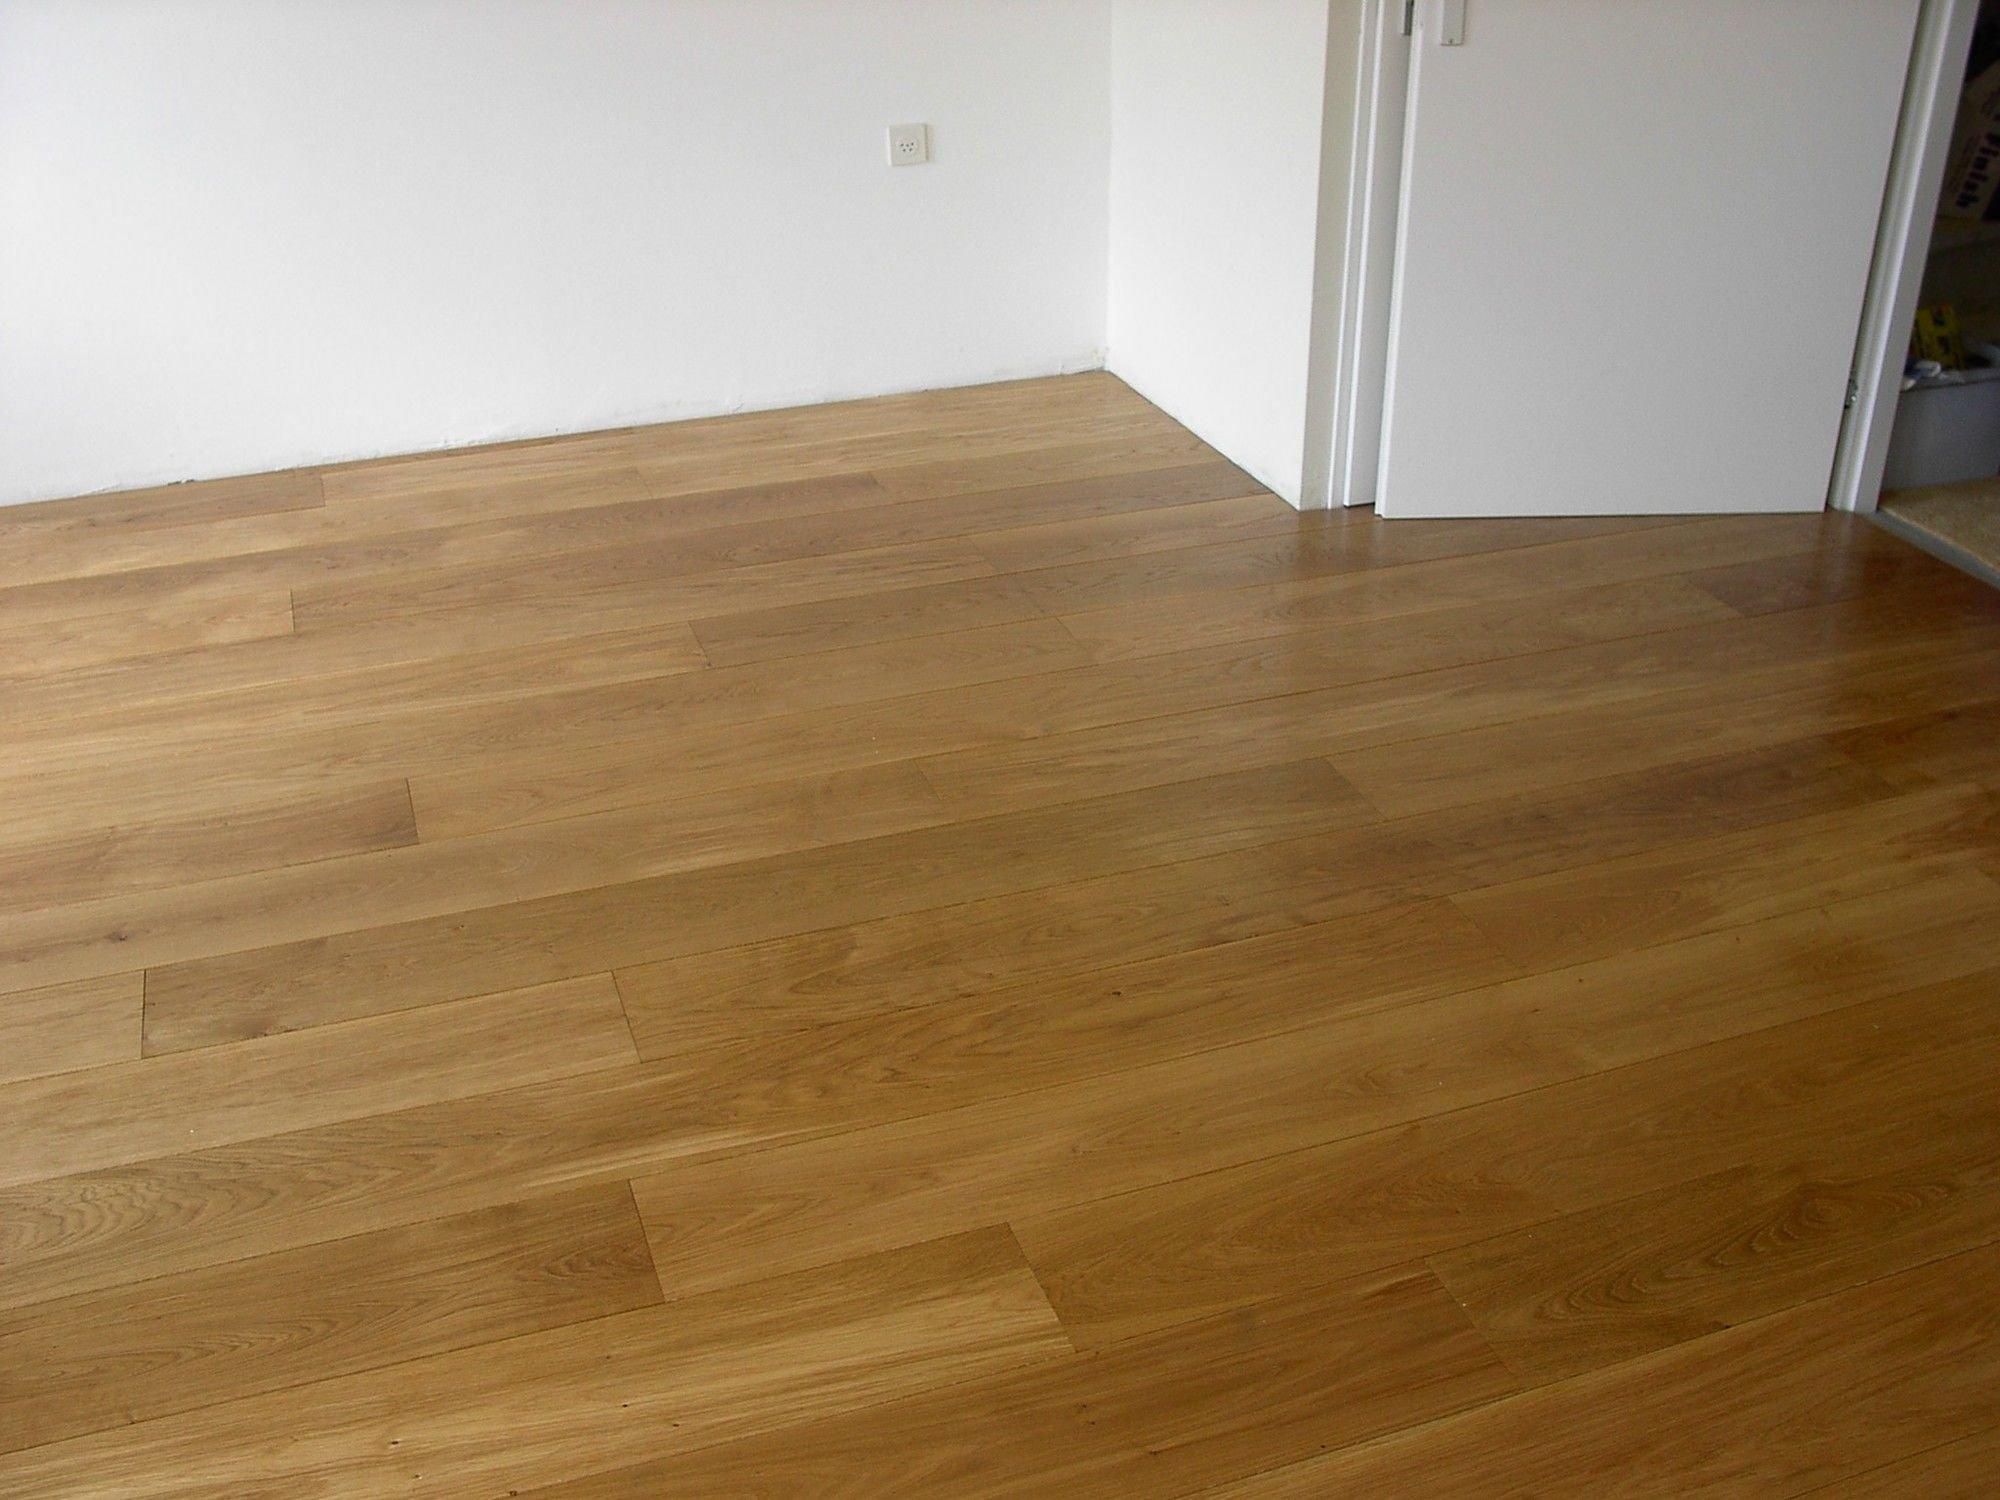 Houten Vloeren Restpartij : Restpartij houten vloer 80m2 eiken rustiek a b 24cm 4mm top kopen